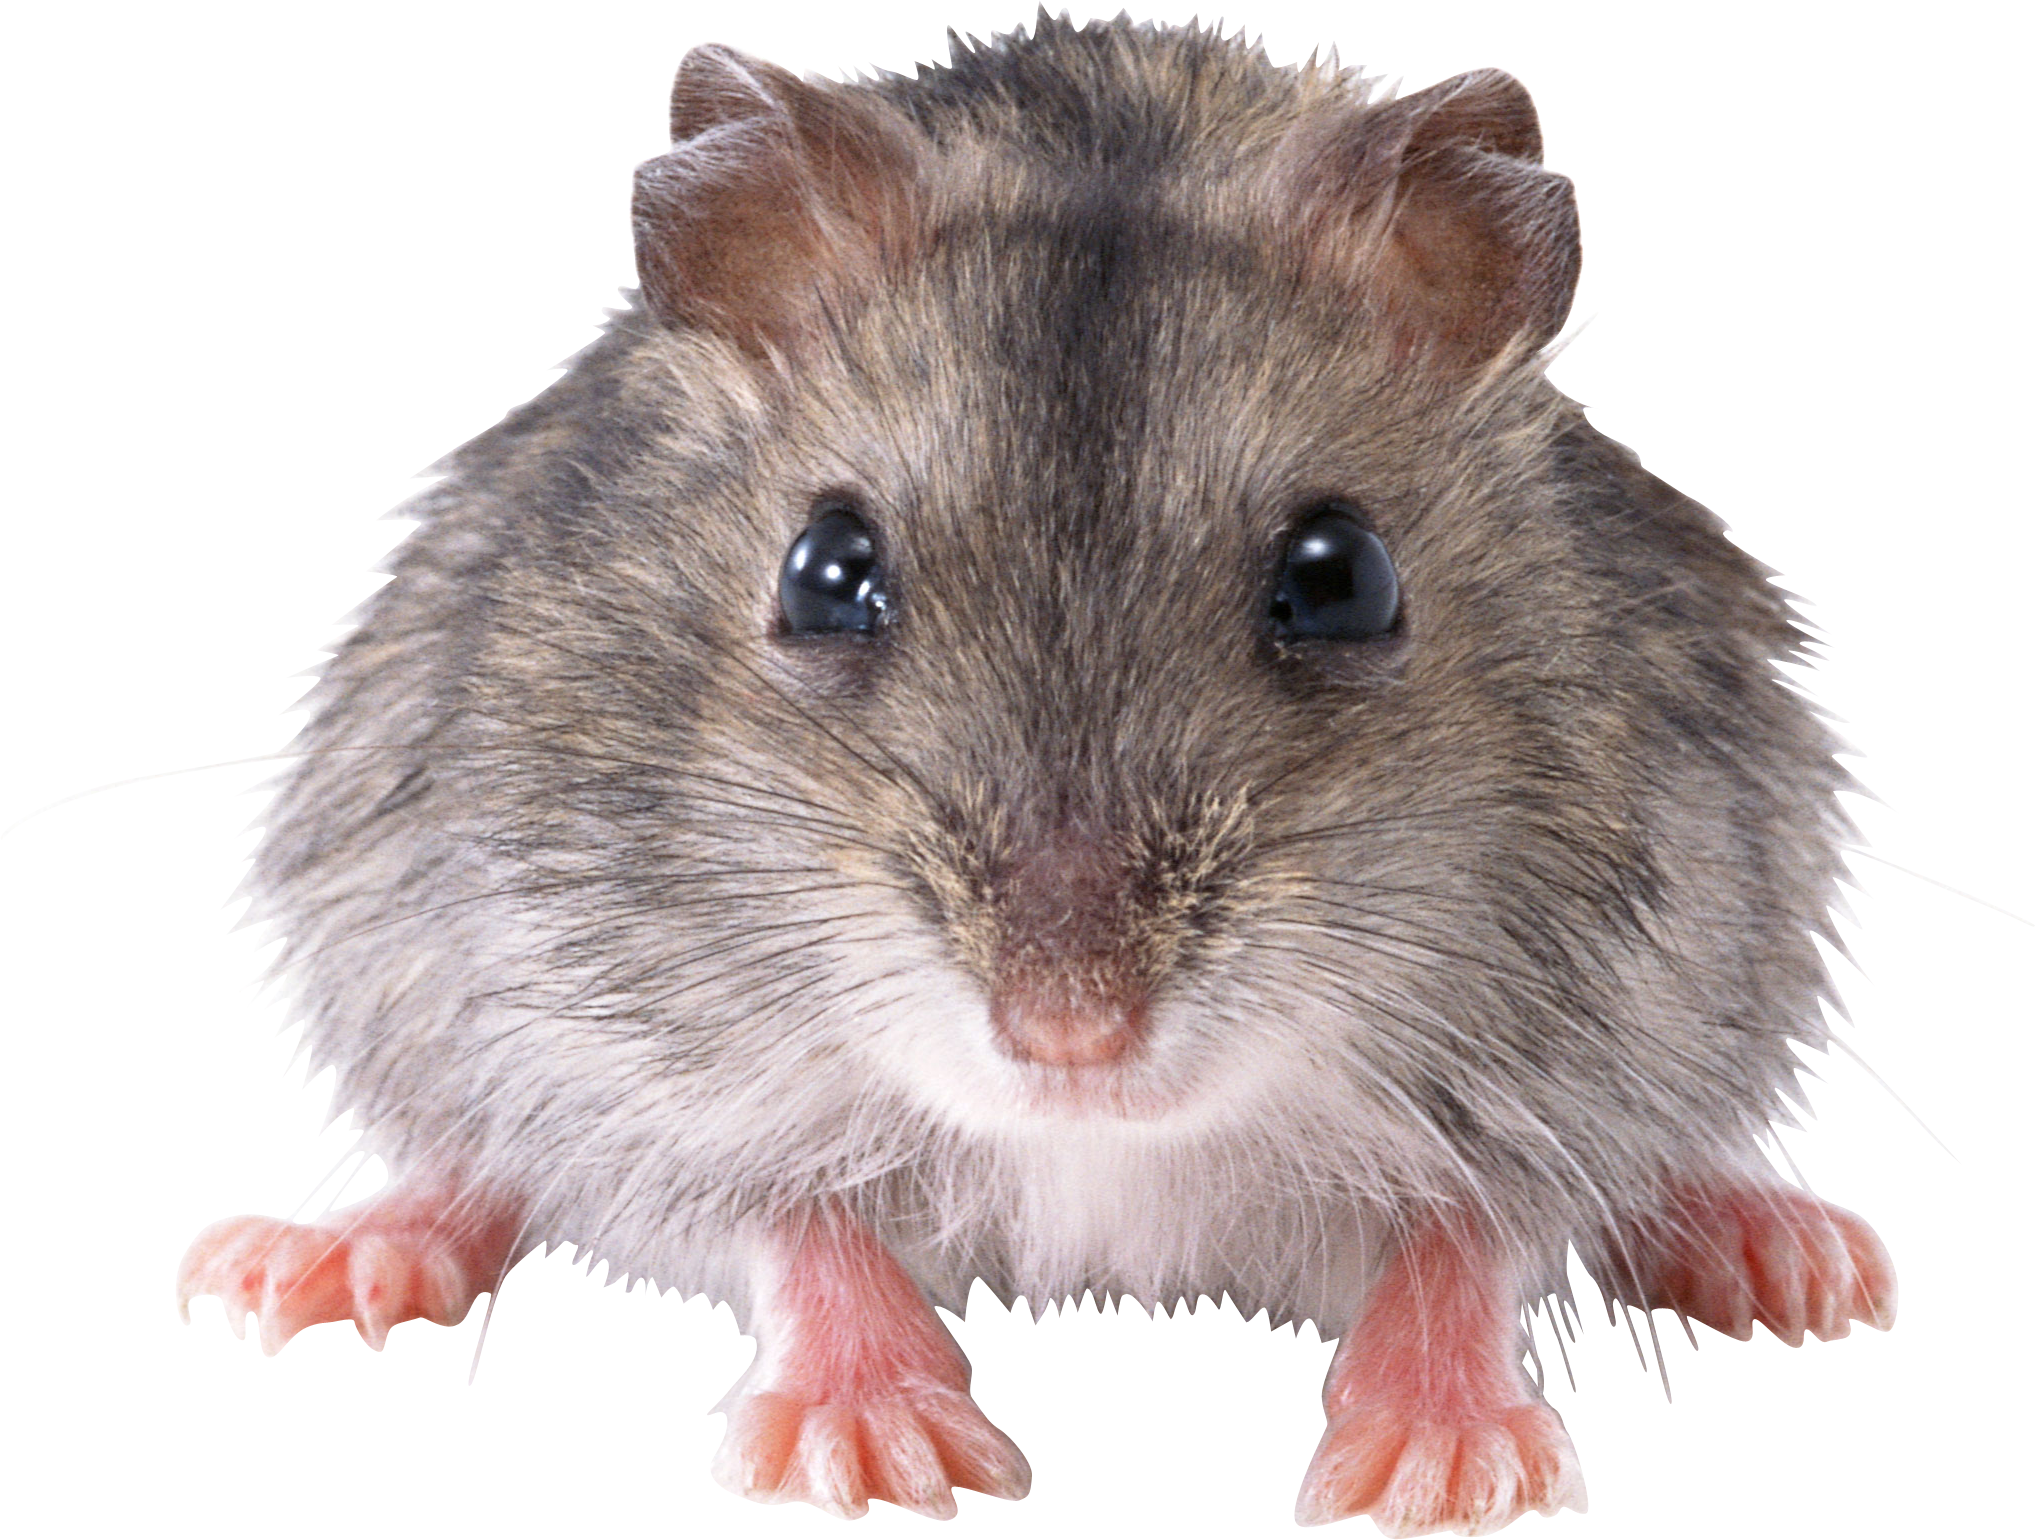 mouse, rat PNG image | Clipart Panda - Free Clipart Images